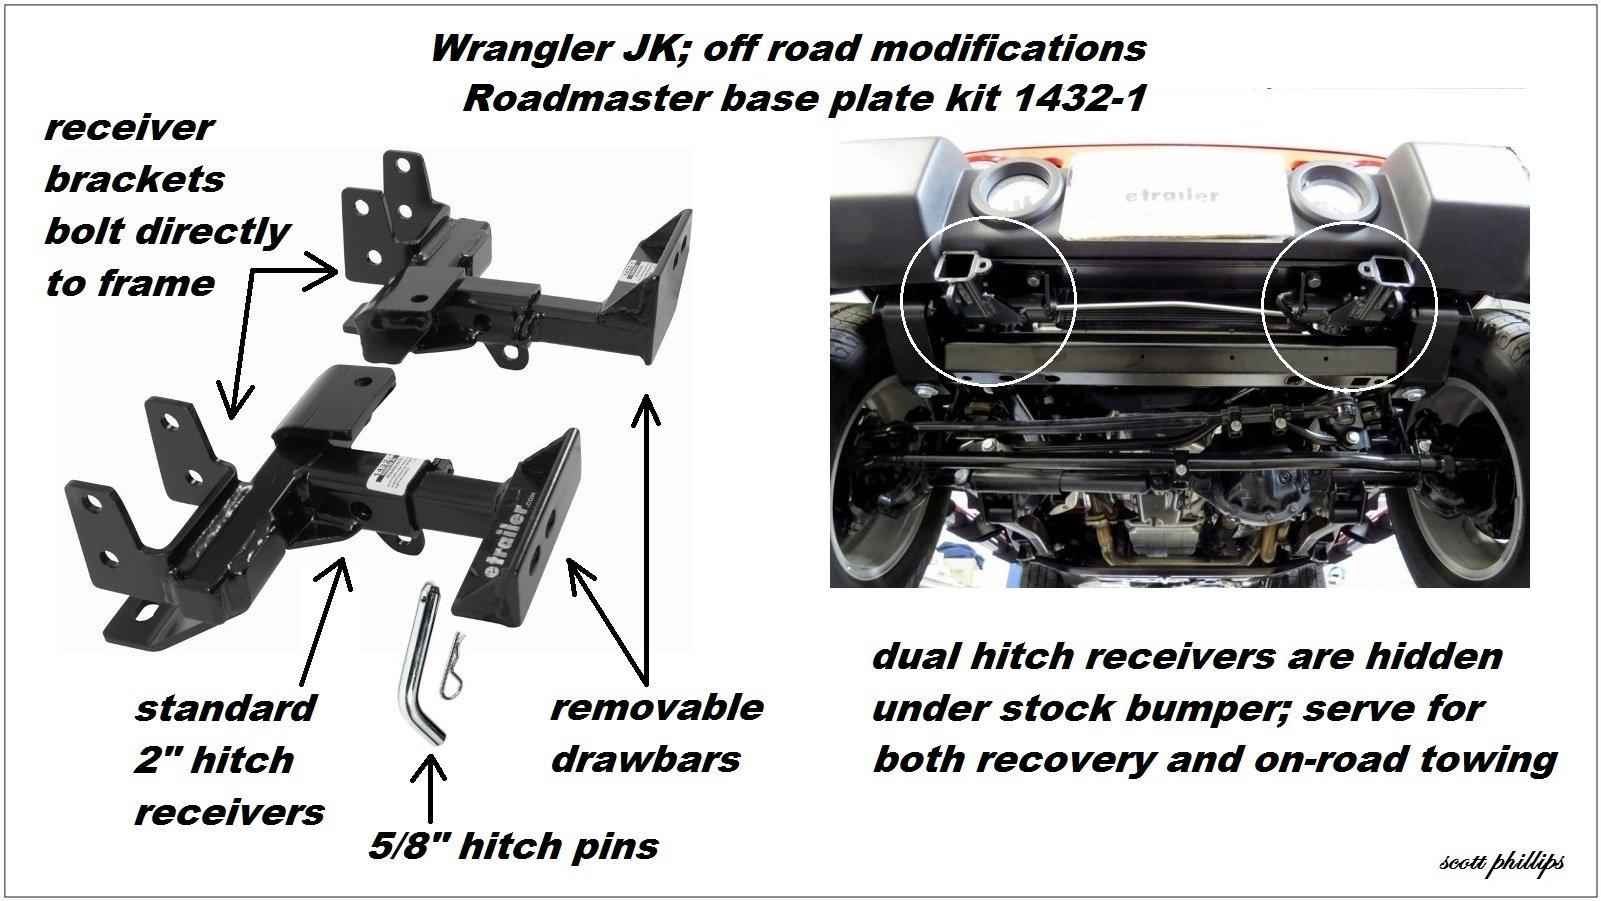 Jeep Wrangler Jk To Present Off Road Modifications